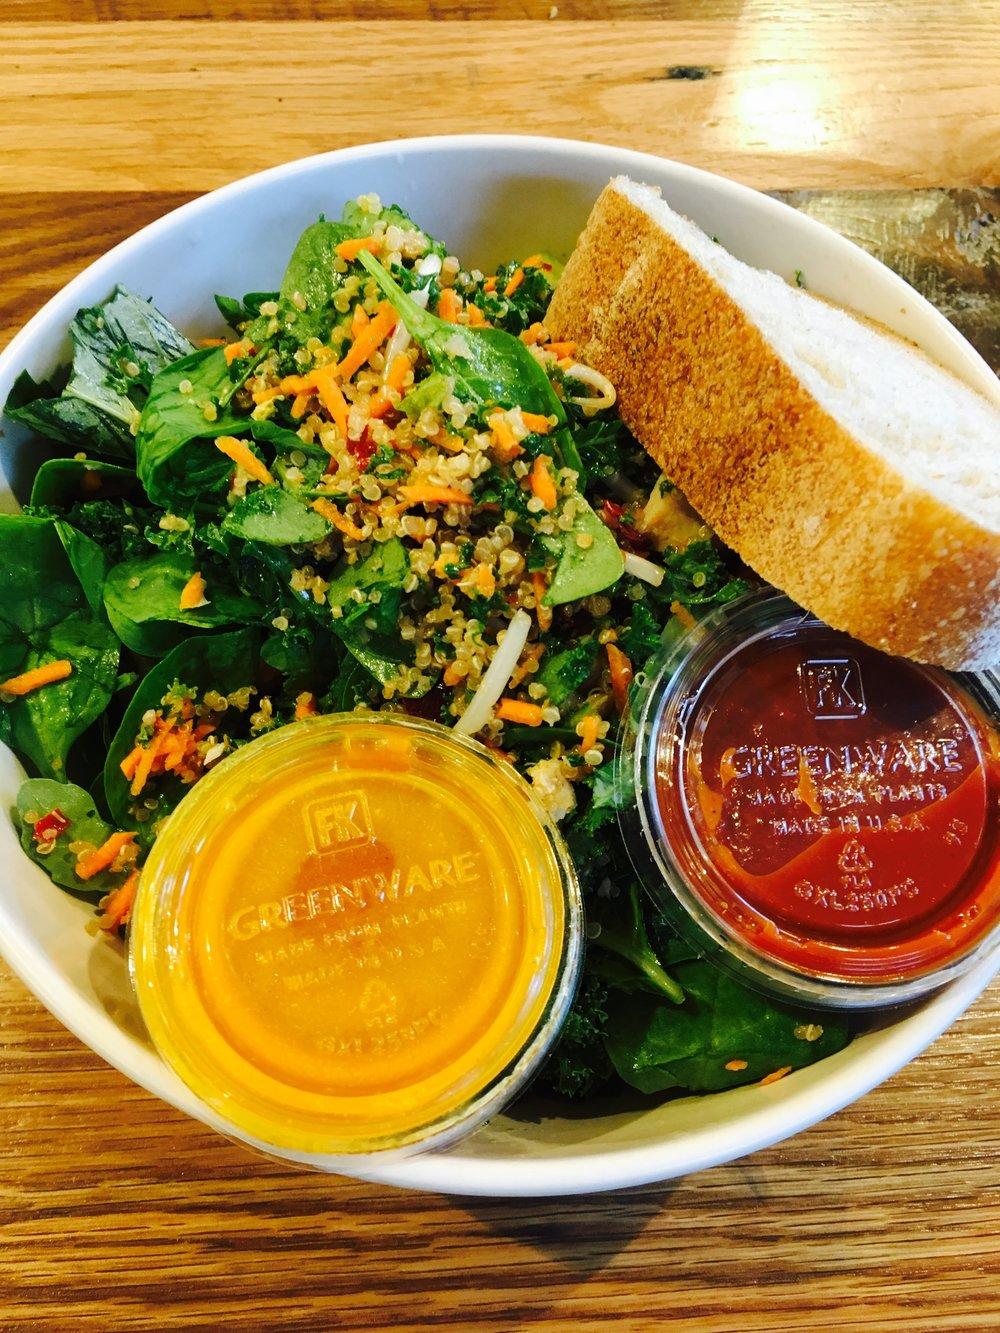 Delicious Salad at Sweetgreen.JPG